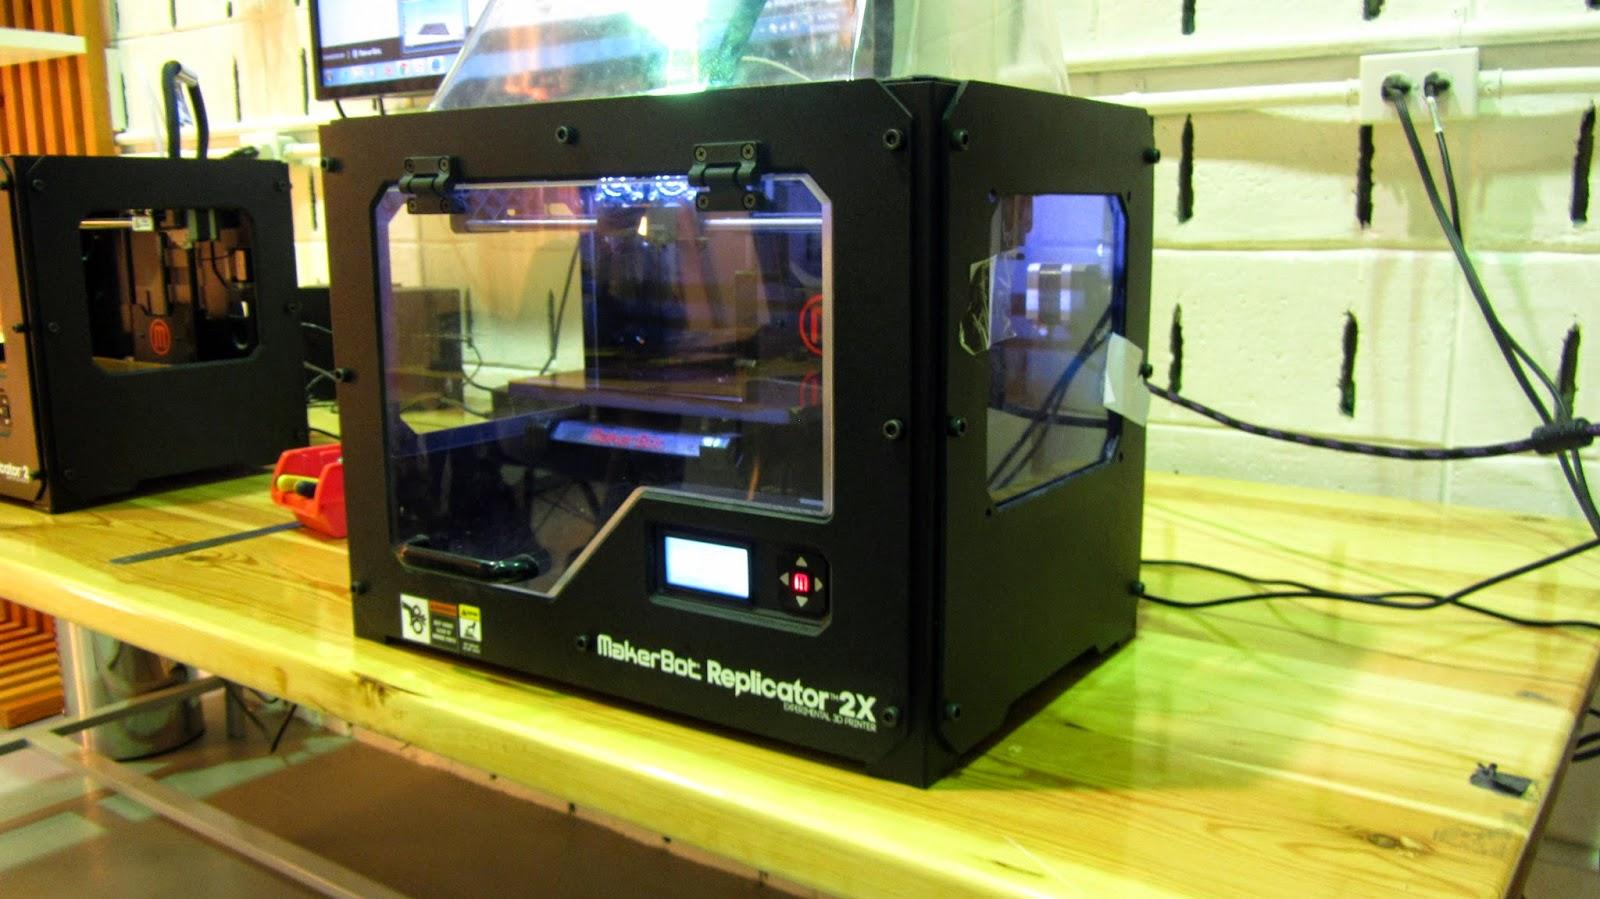 Makerbot 3D printer FABLAB KFUPM Dhahran Saudi Arabia blog